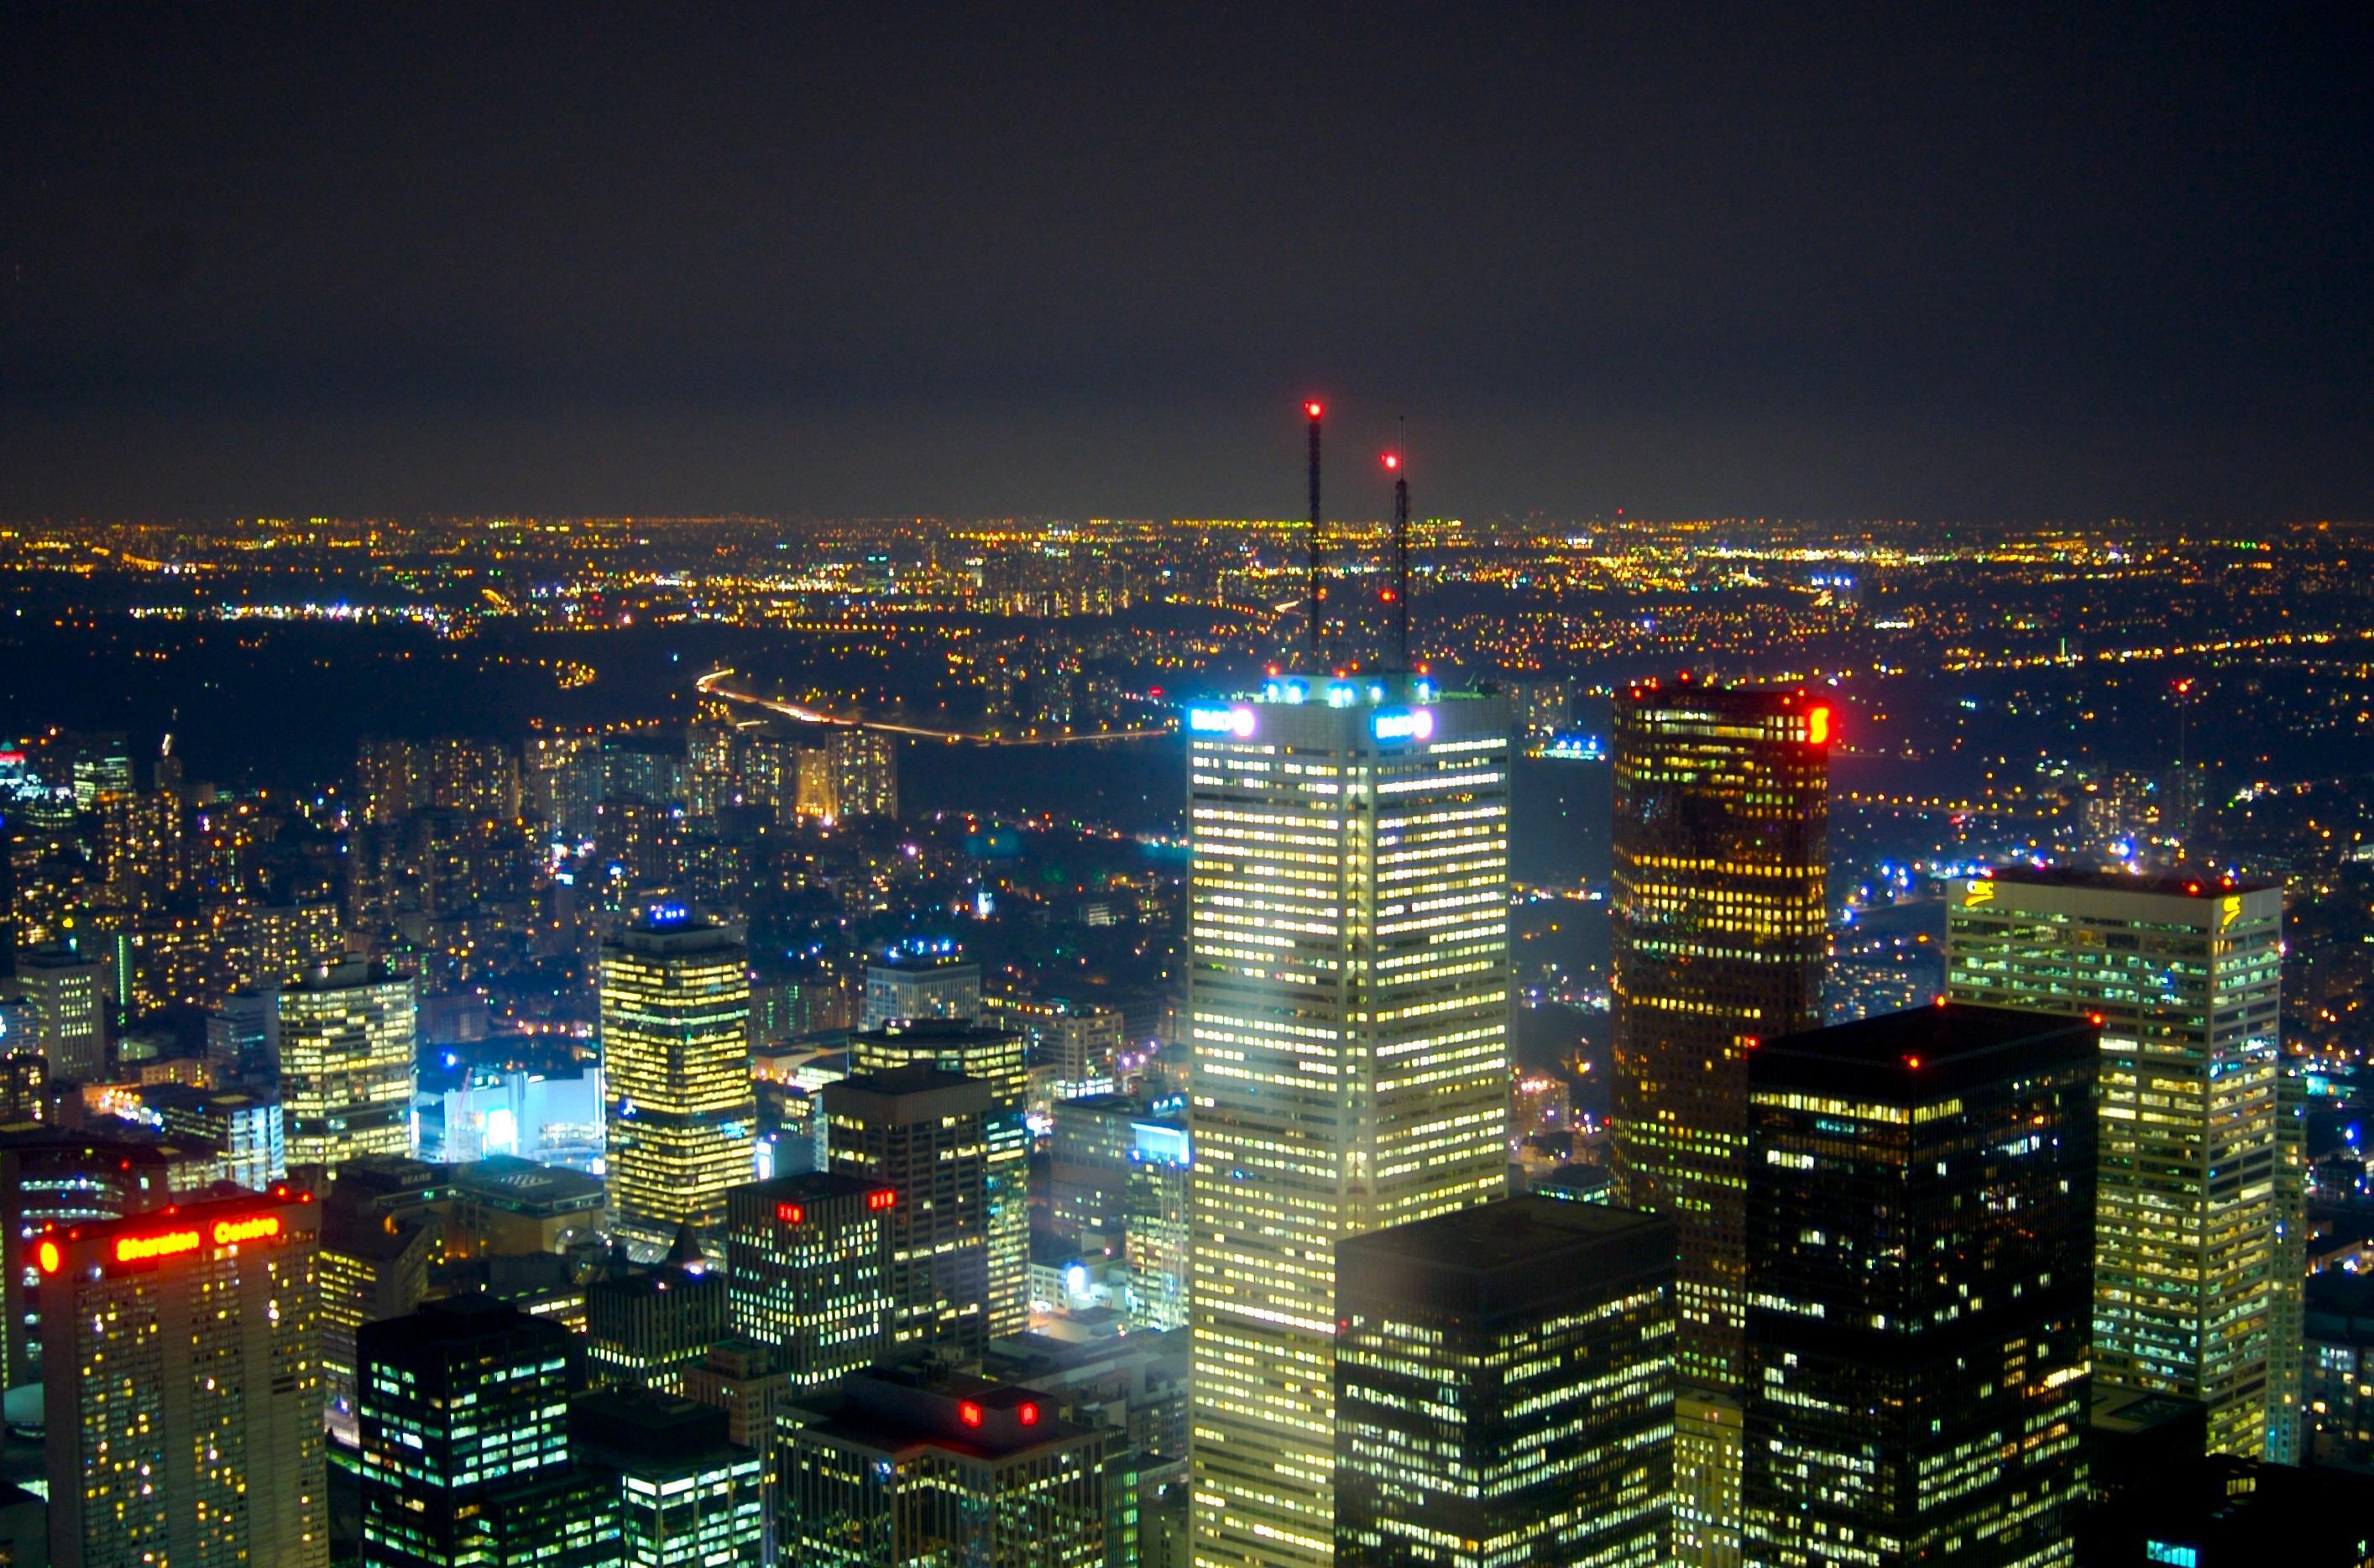 Description A view of Toronto at nightjpg 2828x1868